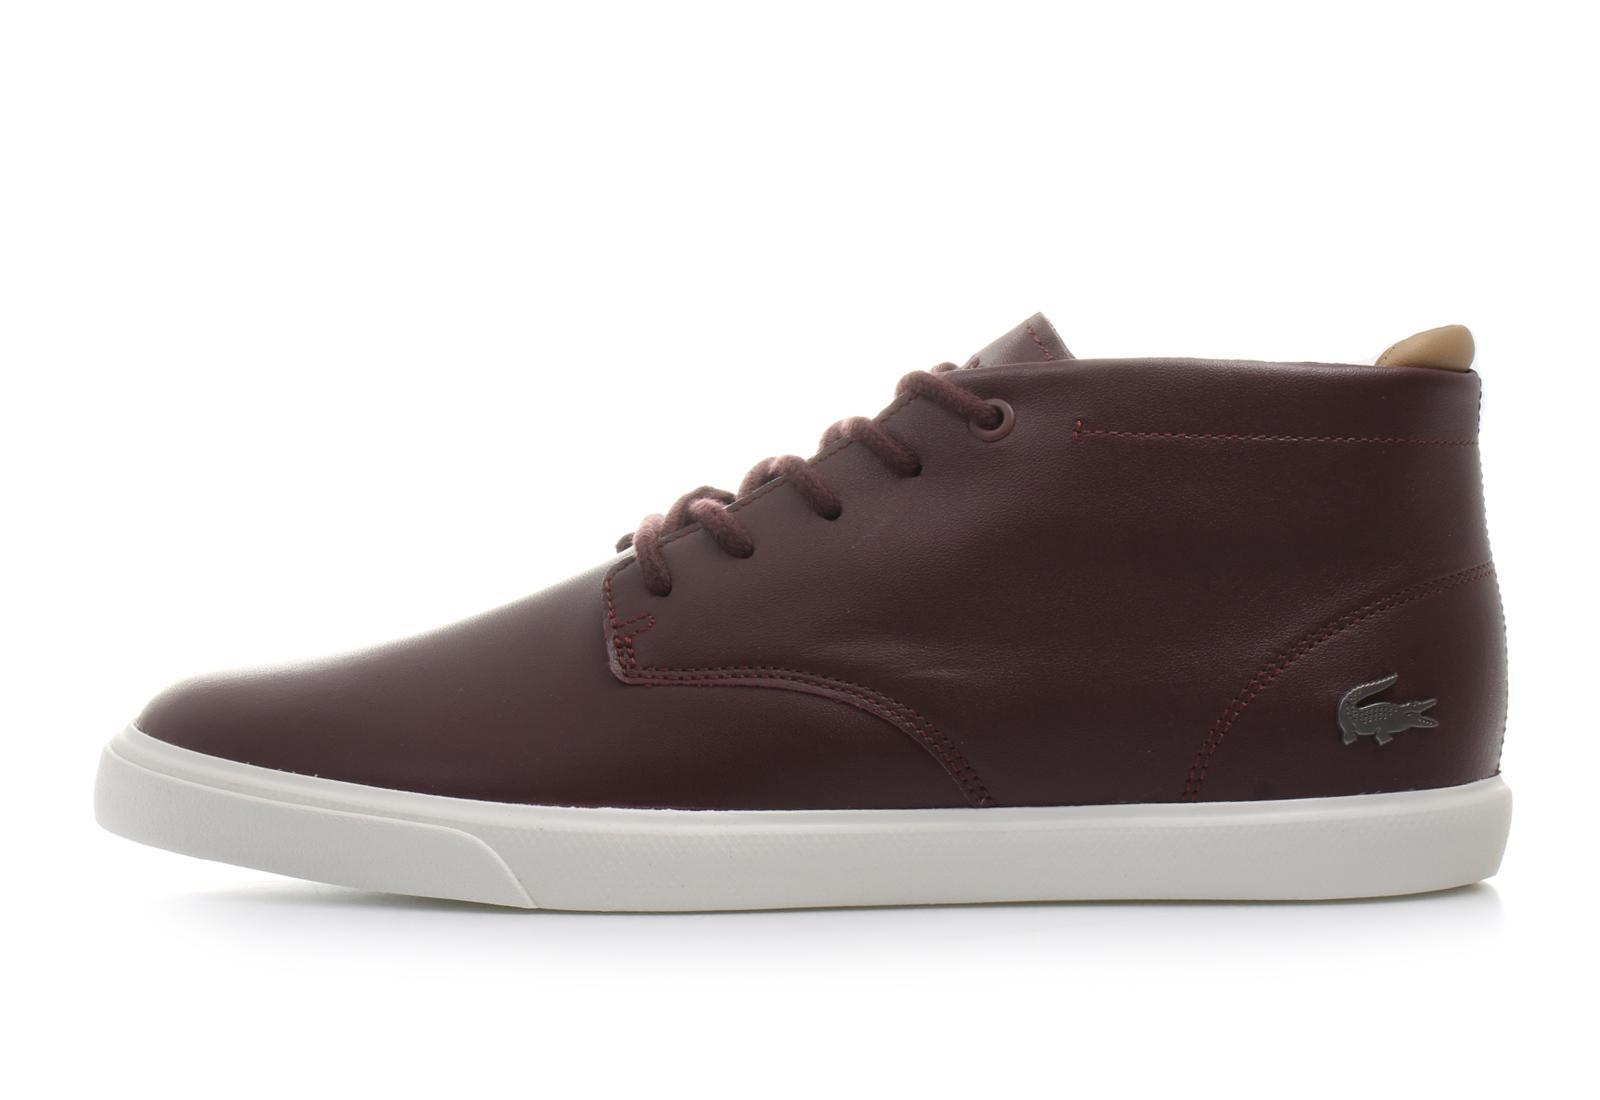 Lacoste Cipő - Espere Chukka - 173CAM0013-176 - Office Shoes ... e31b014347